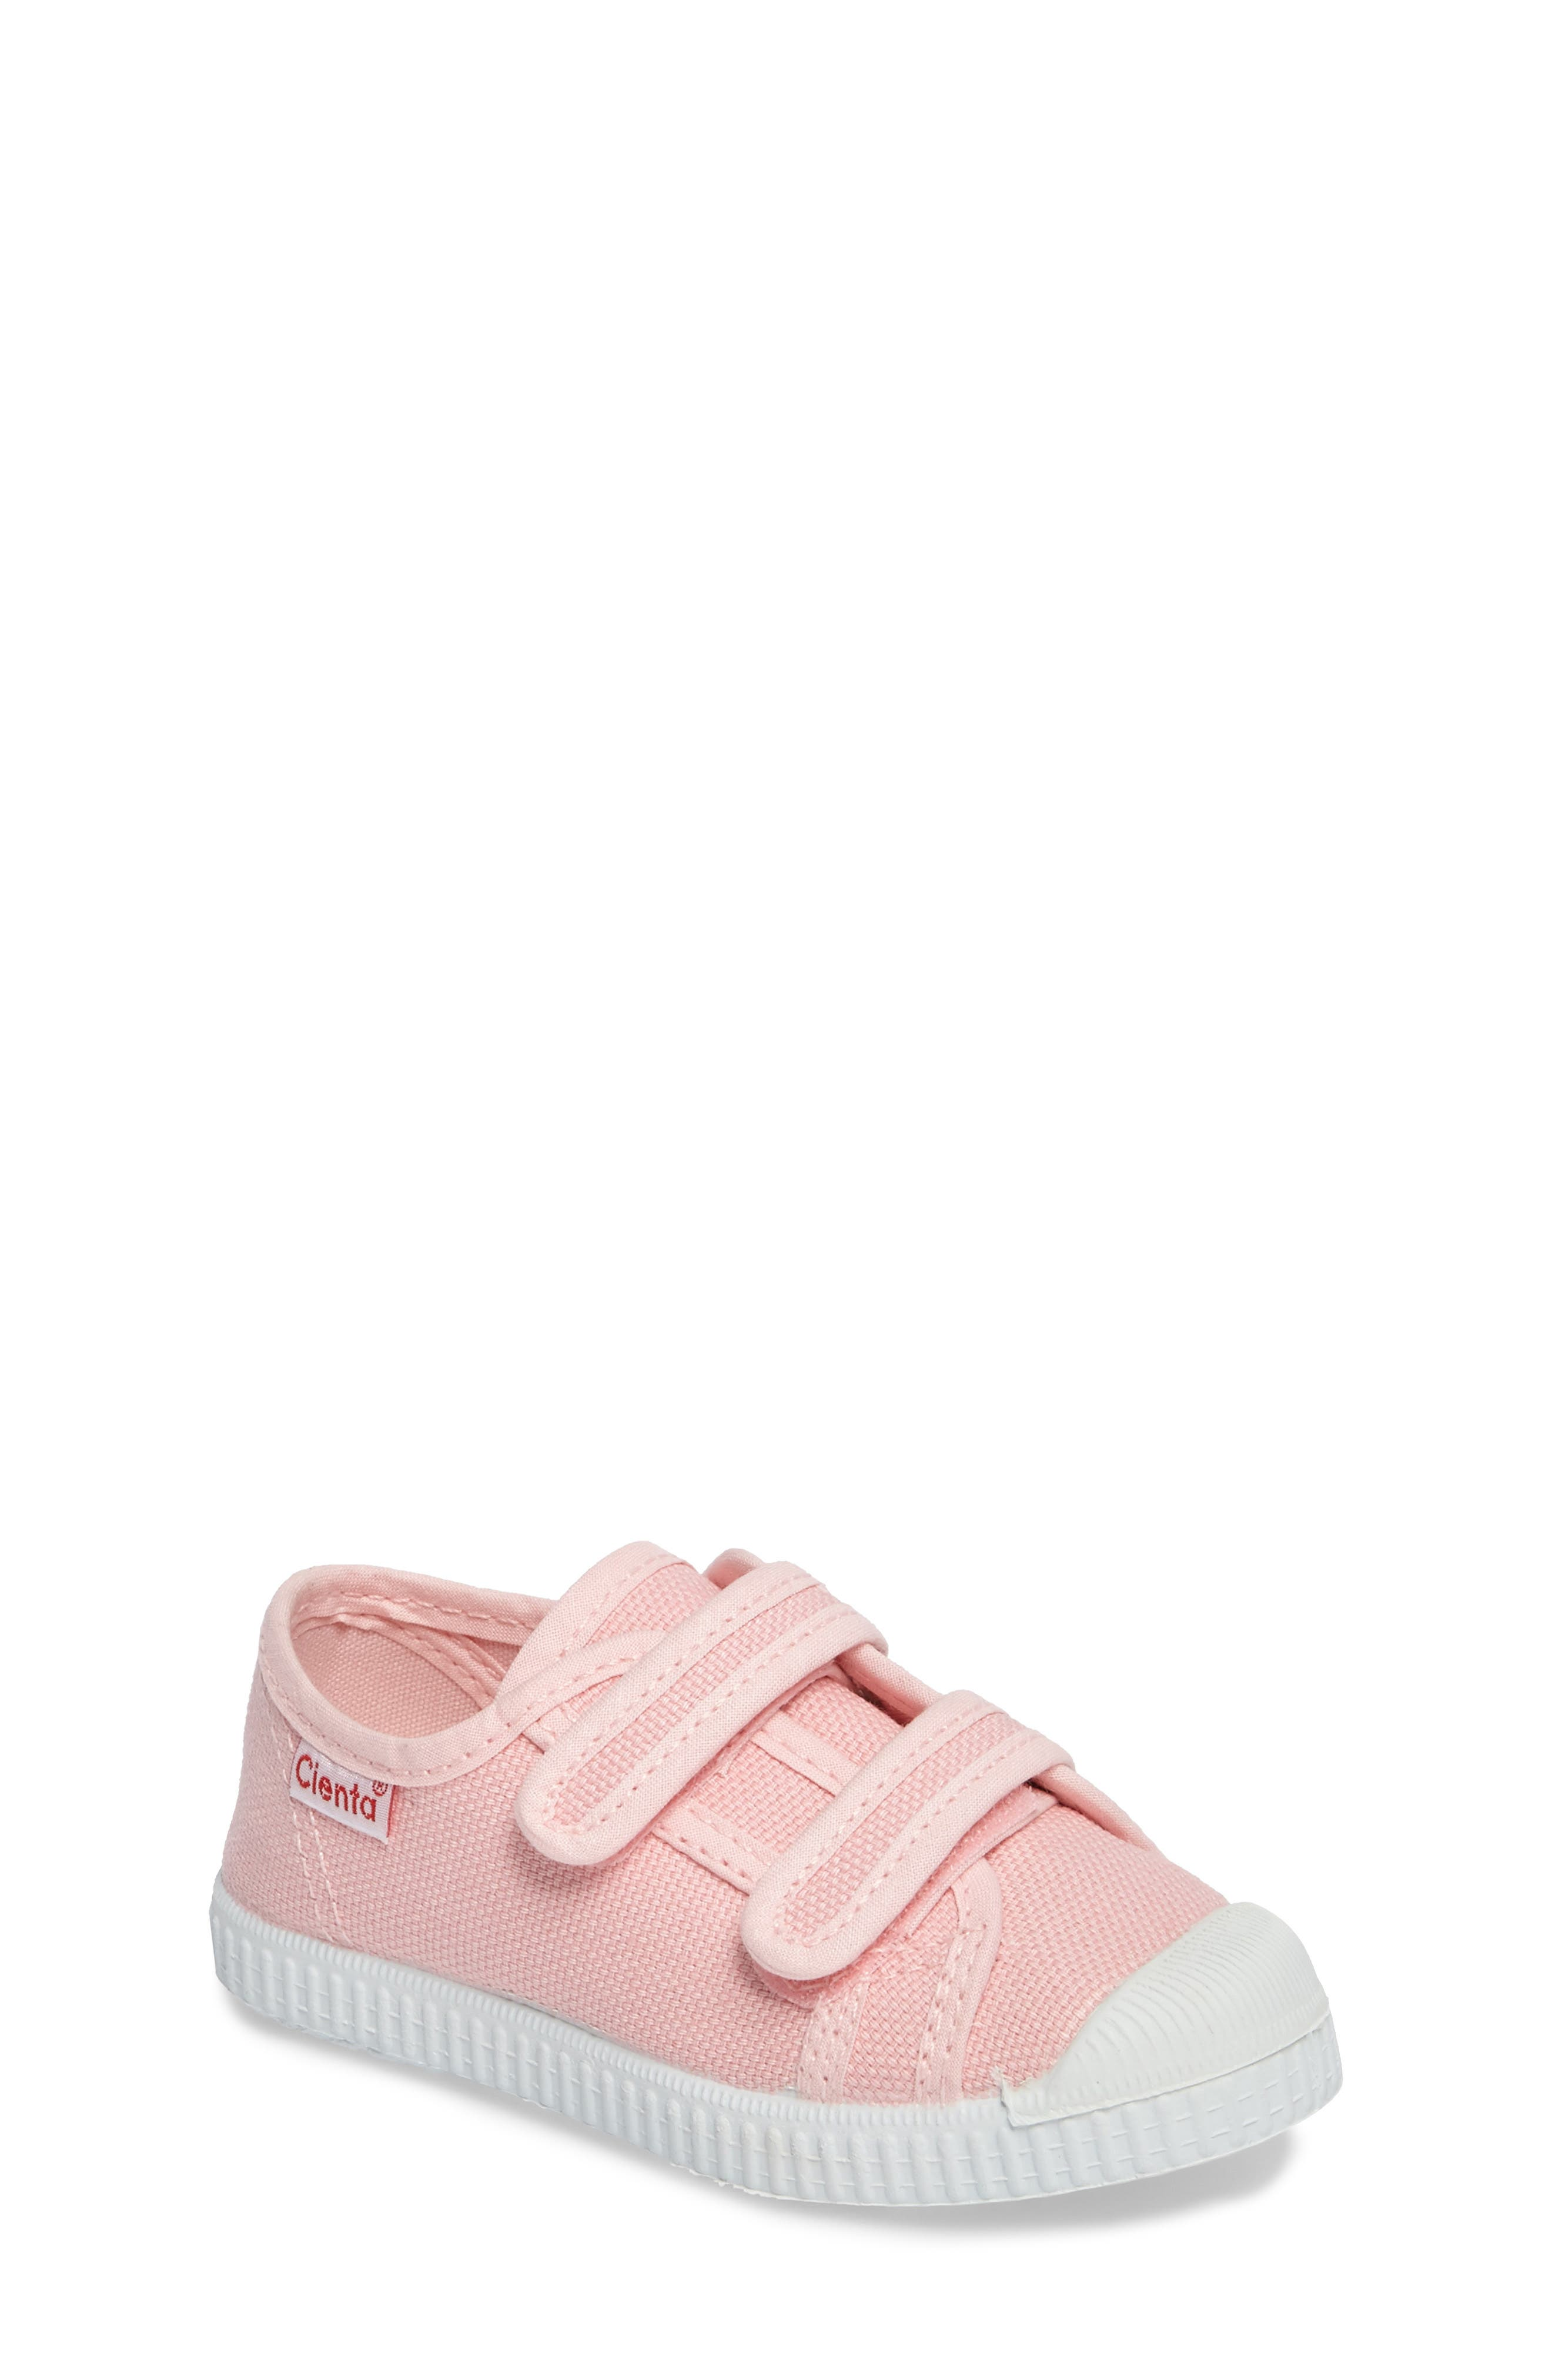 Alternate Image 1 Selected - Cienta Canvas Sneaker (Walker & Toddler)